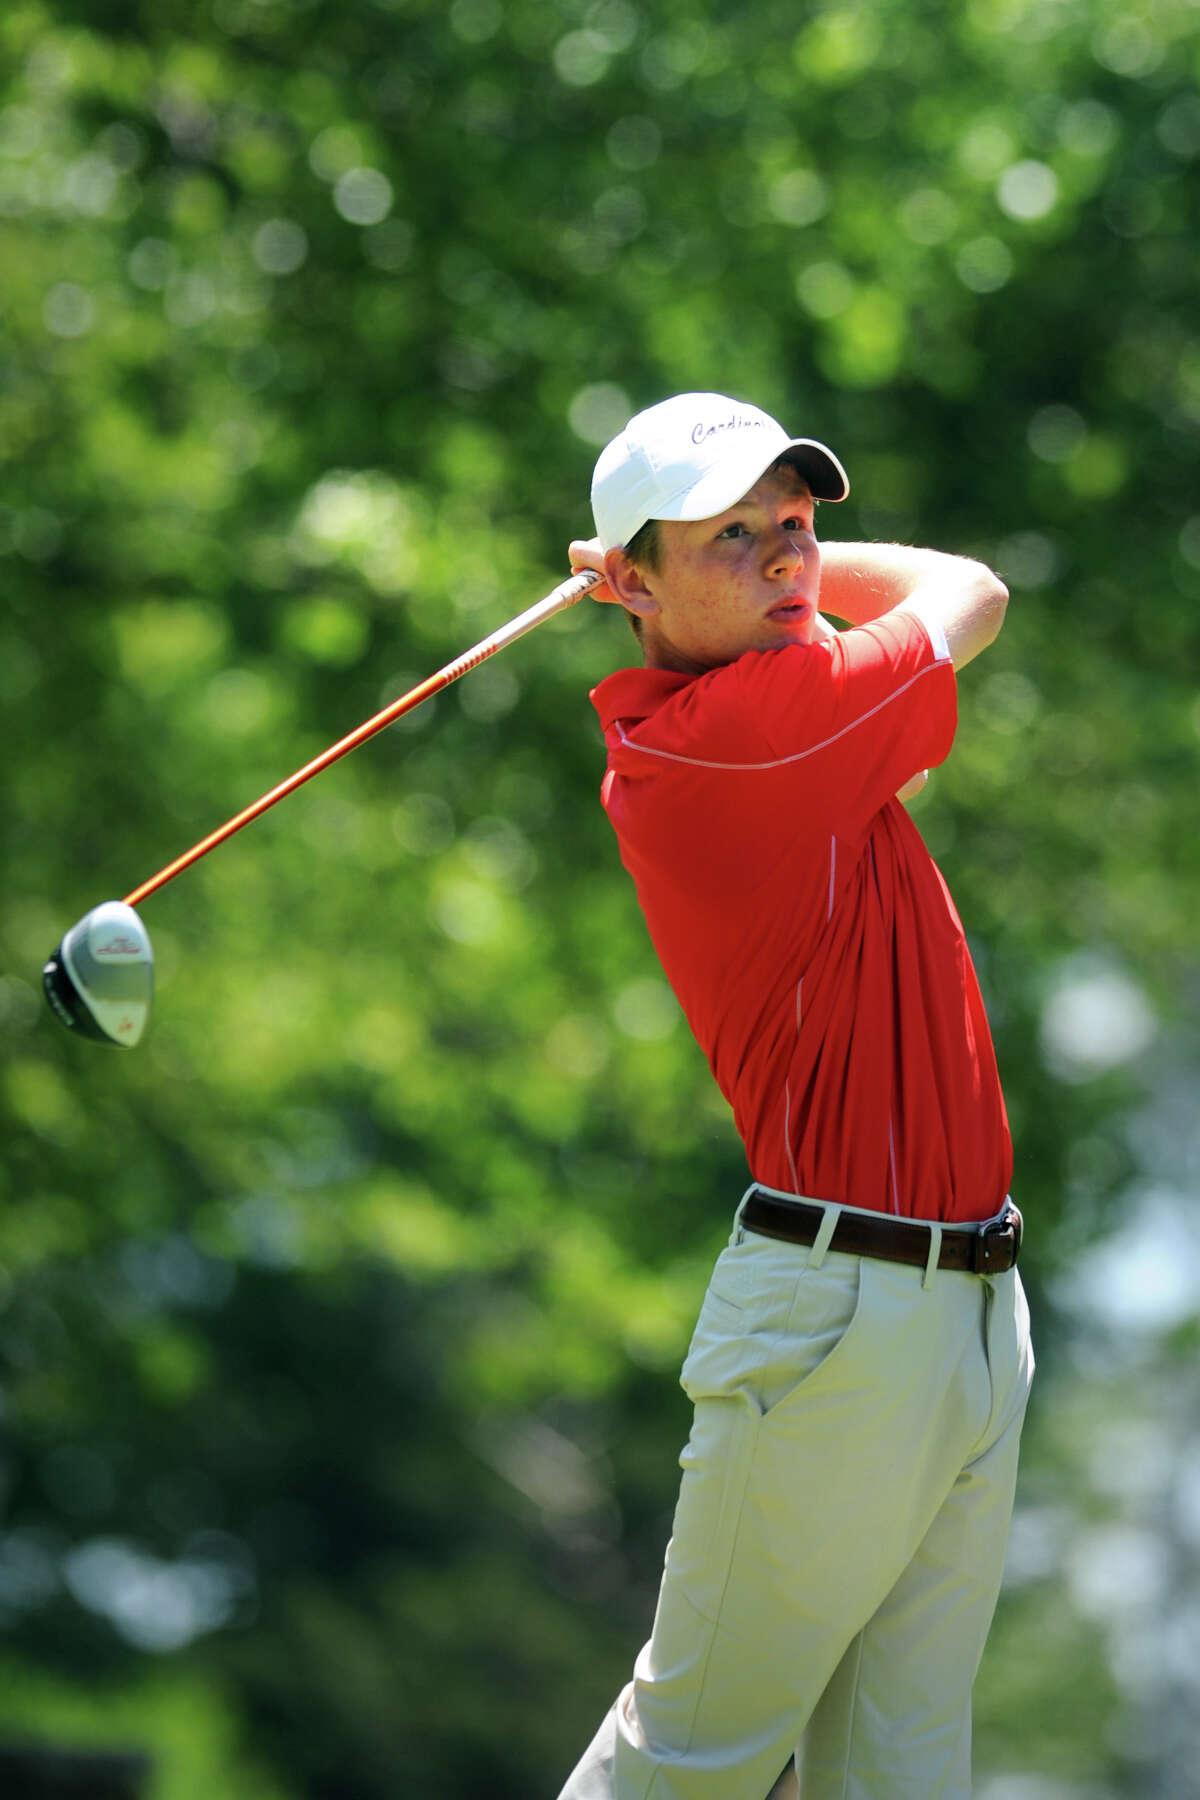 Greenwich High School's Derek Sudell competes in the FCIAC Boy's Golf Championship at Fairchild Wheeler Golf Course, in Fairfield, Conn. June 2, 2014.